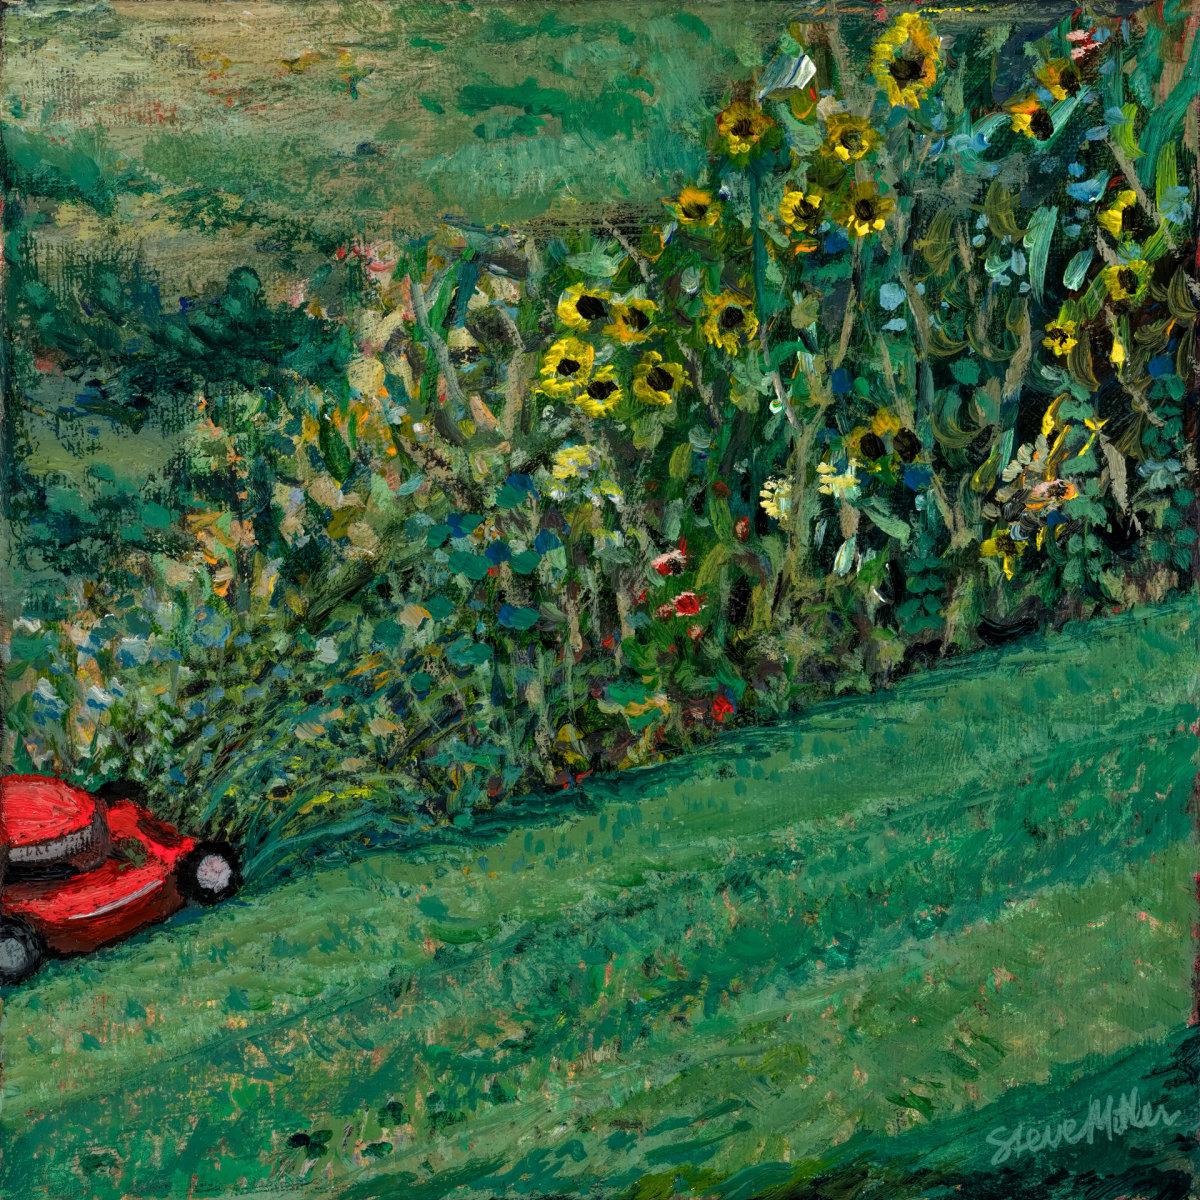 Mow by Steve Miller